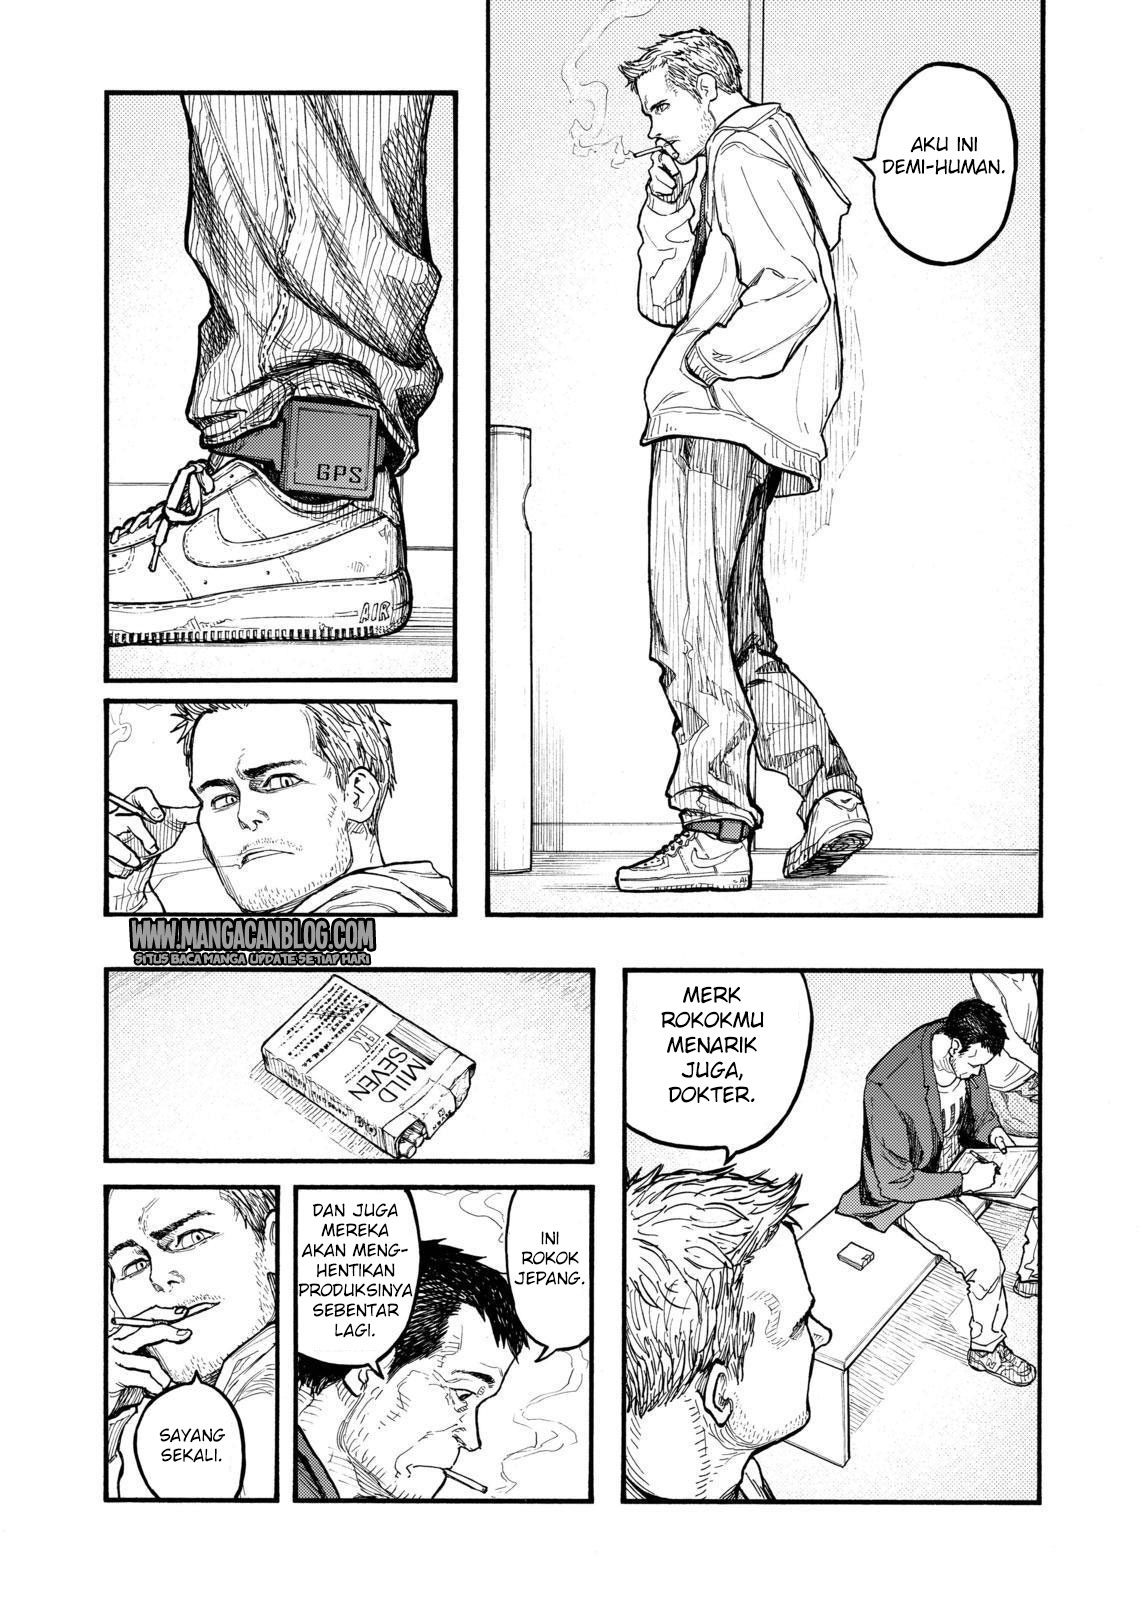 Dilarang COPAS - situs resmi www.mangacanblog.com - Komik ajin 046 - selamat pagi, sampai jumpa besok 47 Indonesia ajin 046 - selamat pagi, sampai jumpa besok Terbaru 16|Baca Manga Komik Indonesia|Mangacan